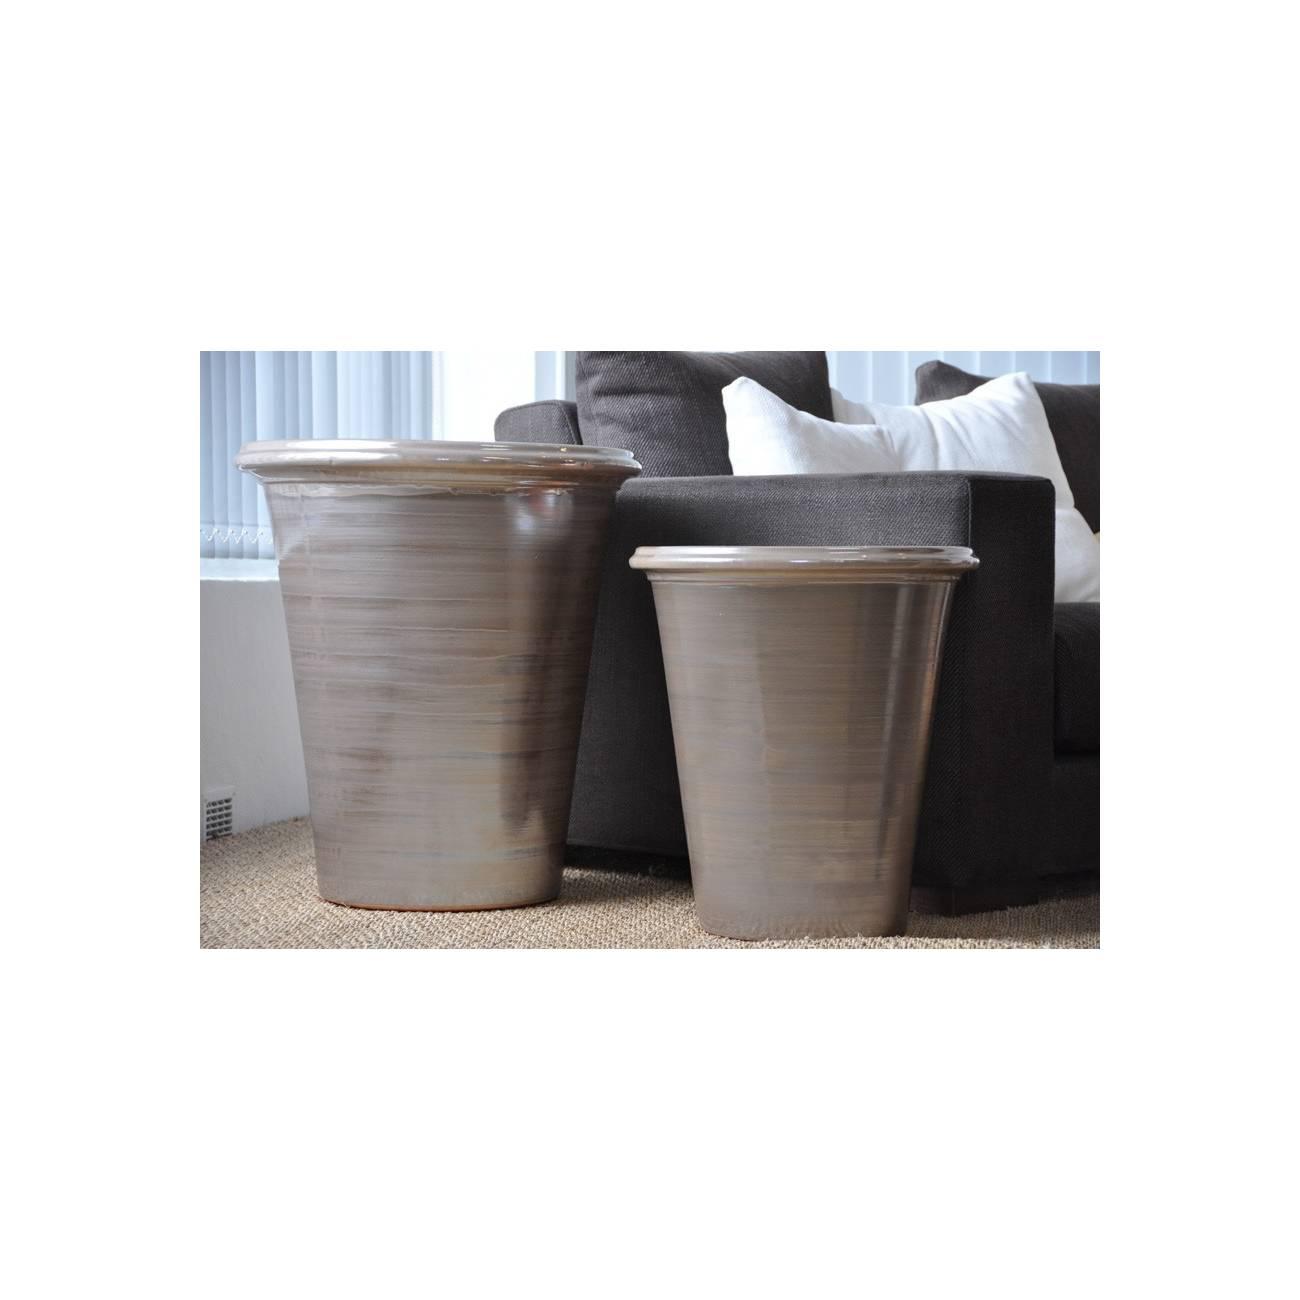 baobab terre d 39 amazonie poterie verte les poteries d 39 albi. Black Bedroom Furniture Sets. Home Design Ideas